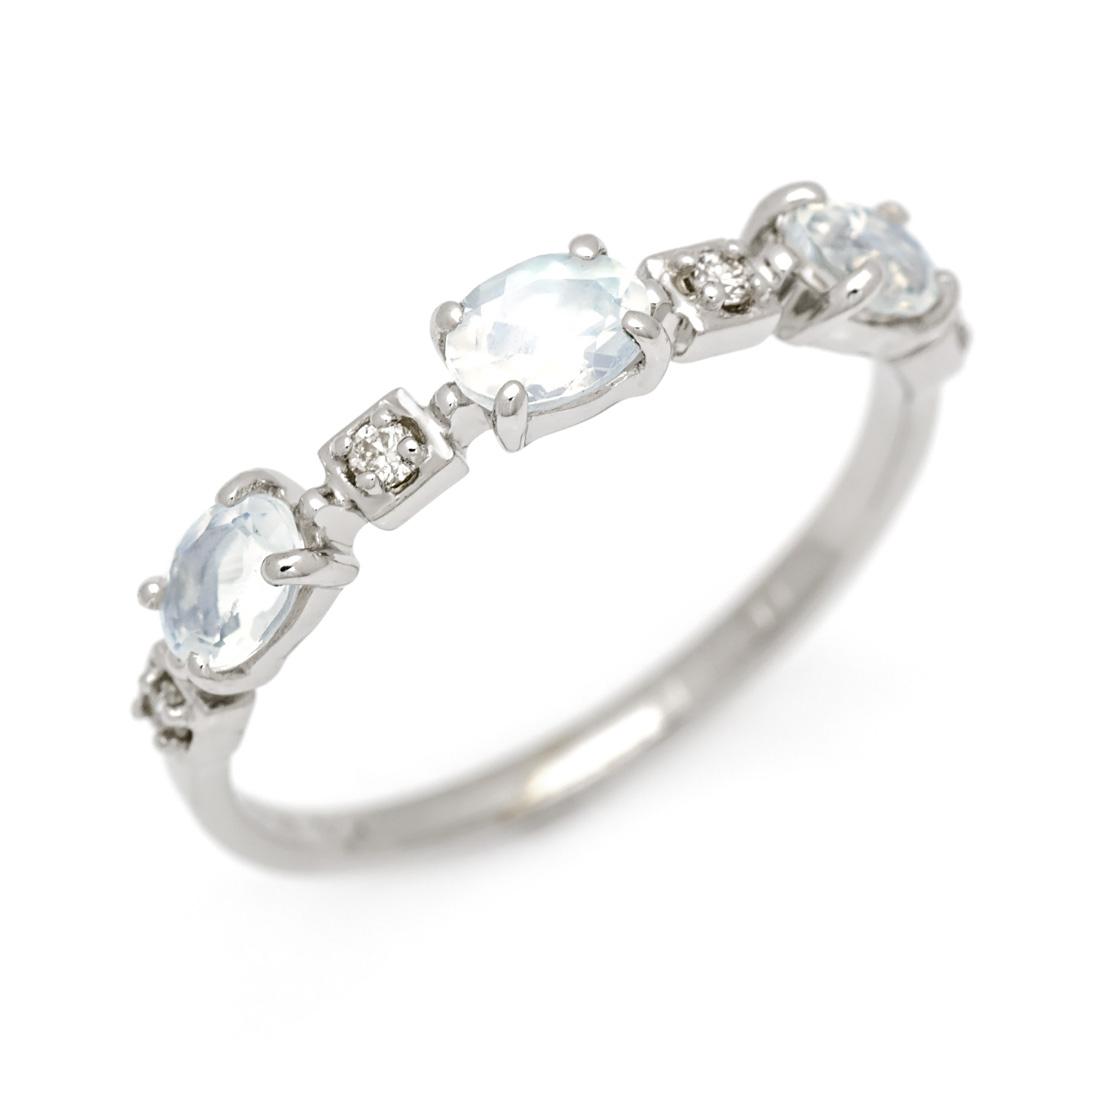 【GWクーポン配布中】K10 ブルームーンストーン ダイヤモンド リング 「purezza」送料無料 指輪 ゴールド 10K 10金 ダイアモンド 誕生日 6月誕生石 刻印 文字入れ メッセージ ギフト 贈り物 ピンキーリング対応可能